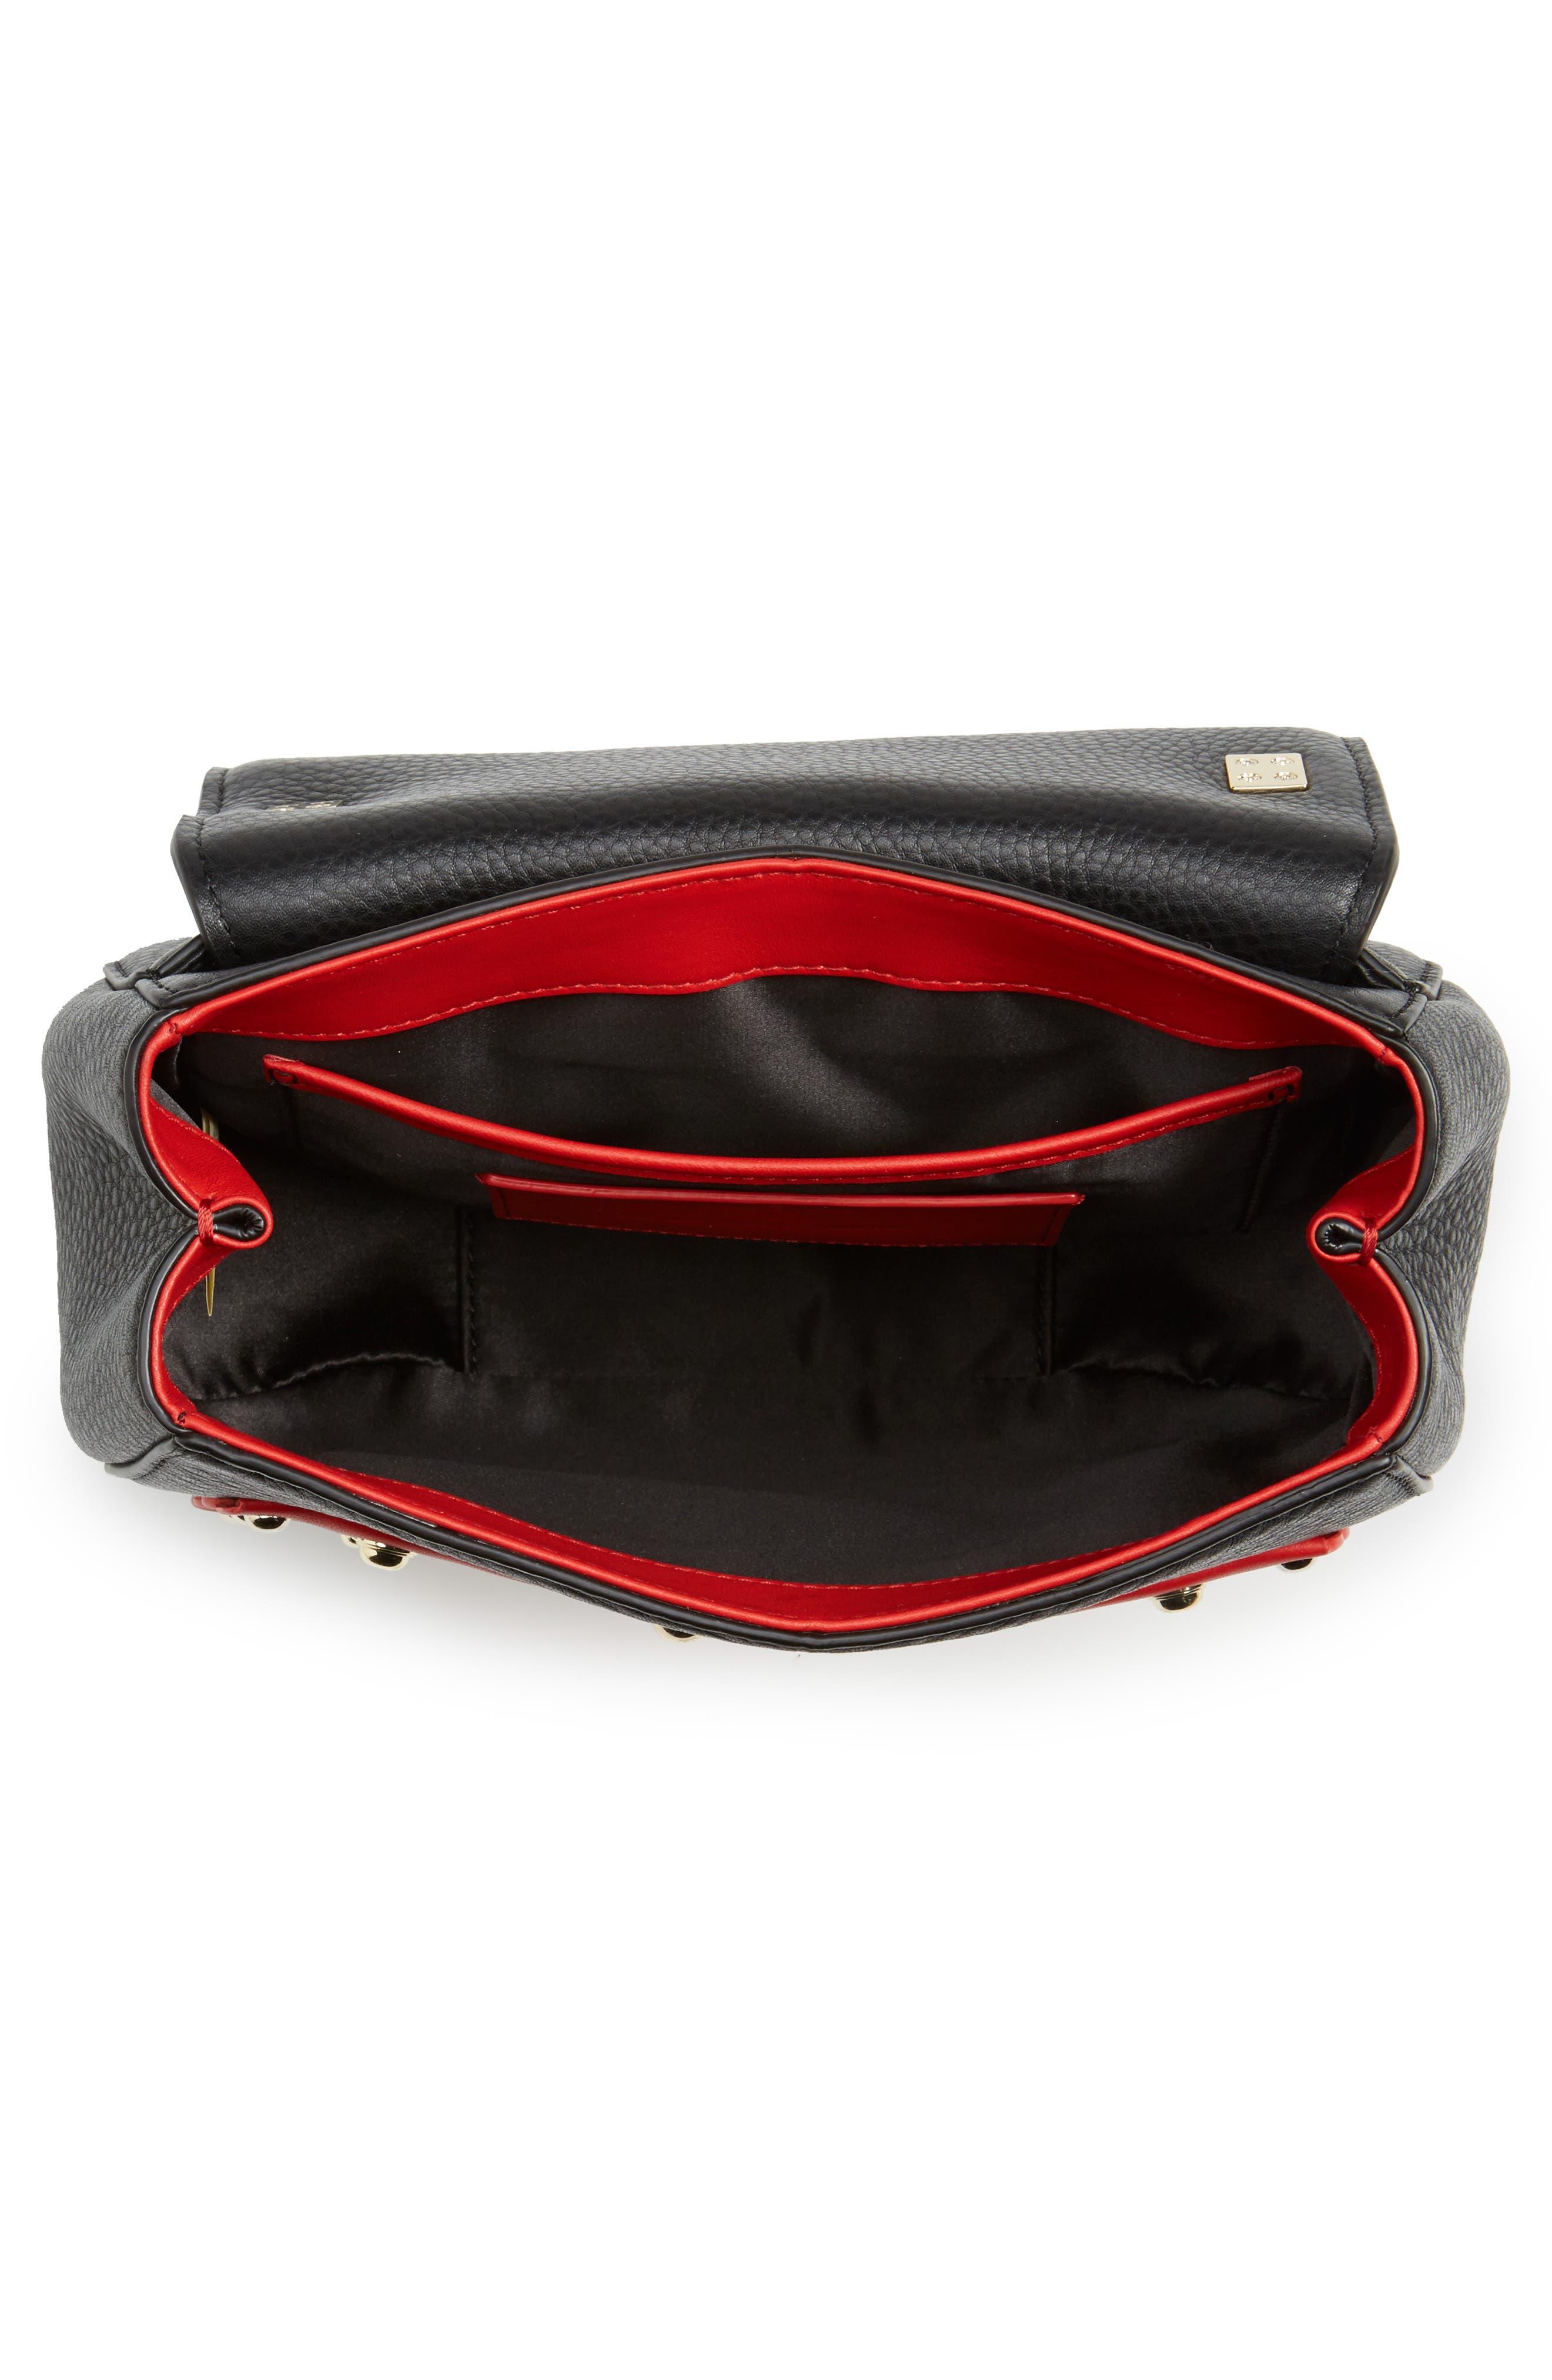 madison stewart street - byrdie studded leather satchel,                             Alternate thumbnail 4, color,                             631